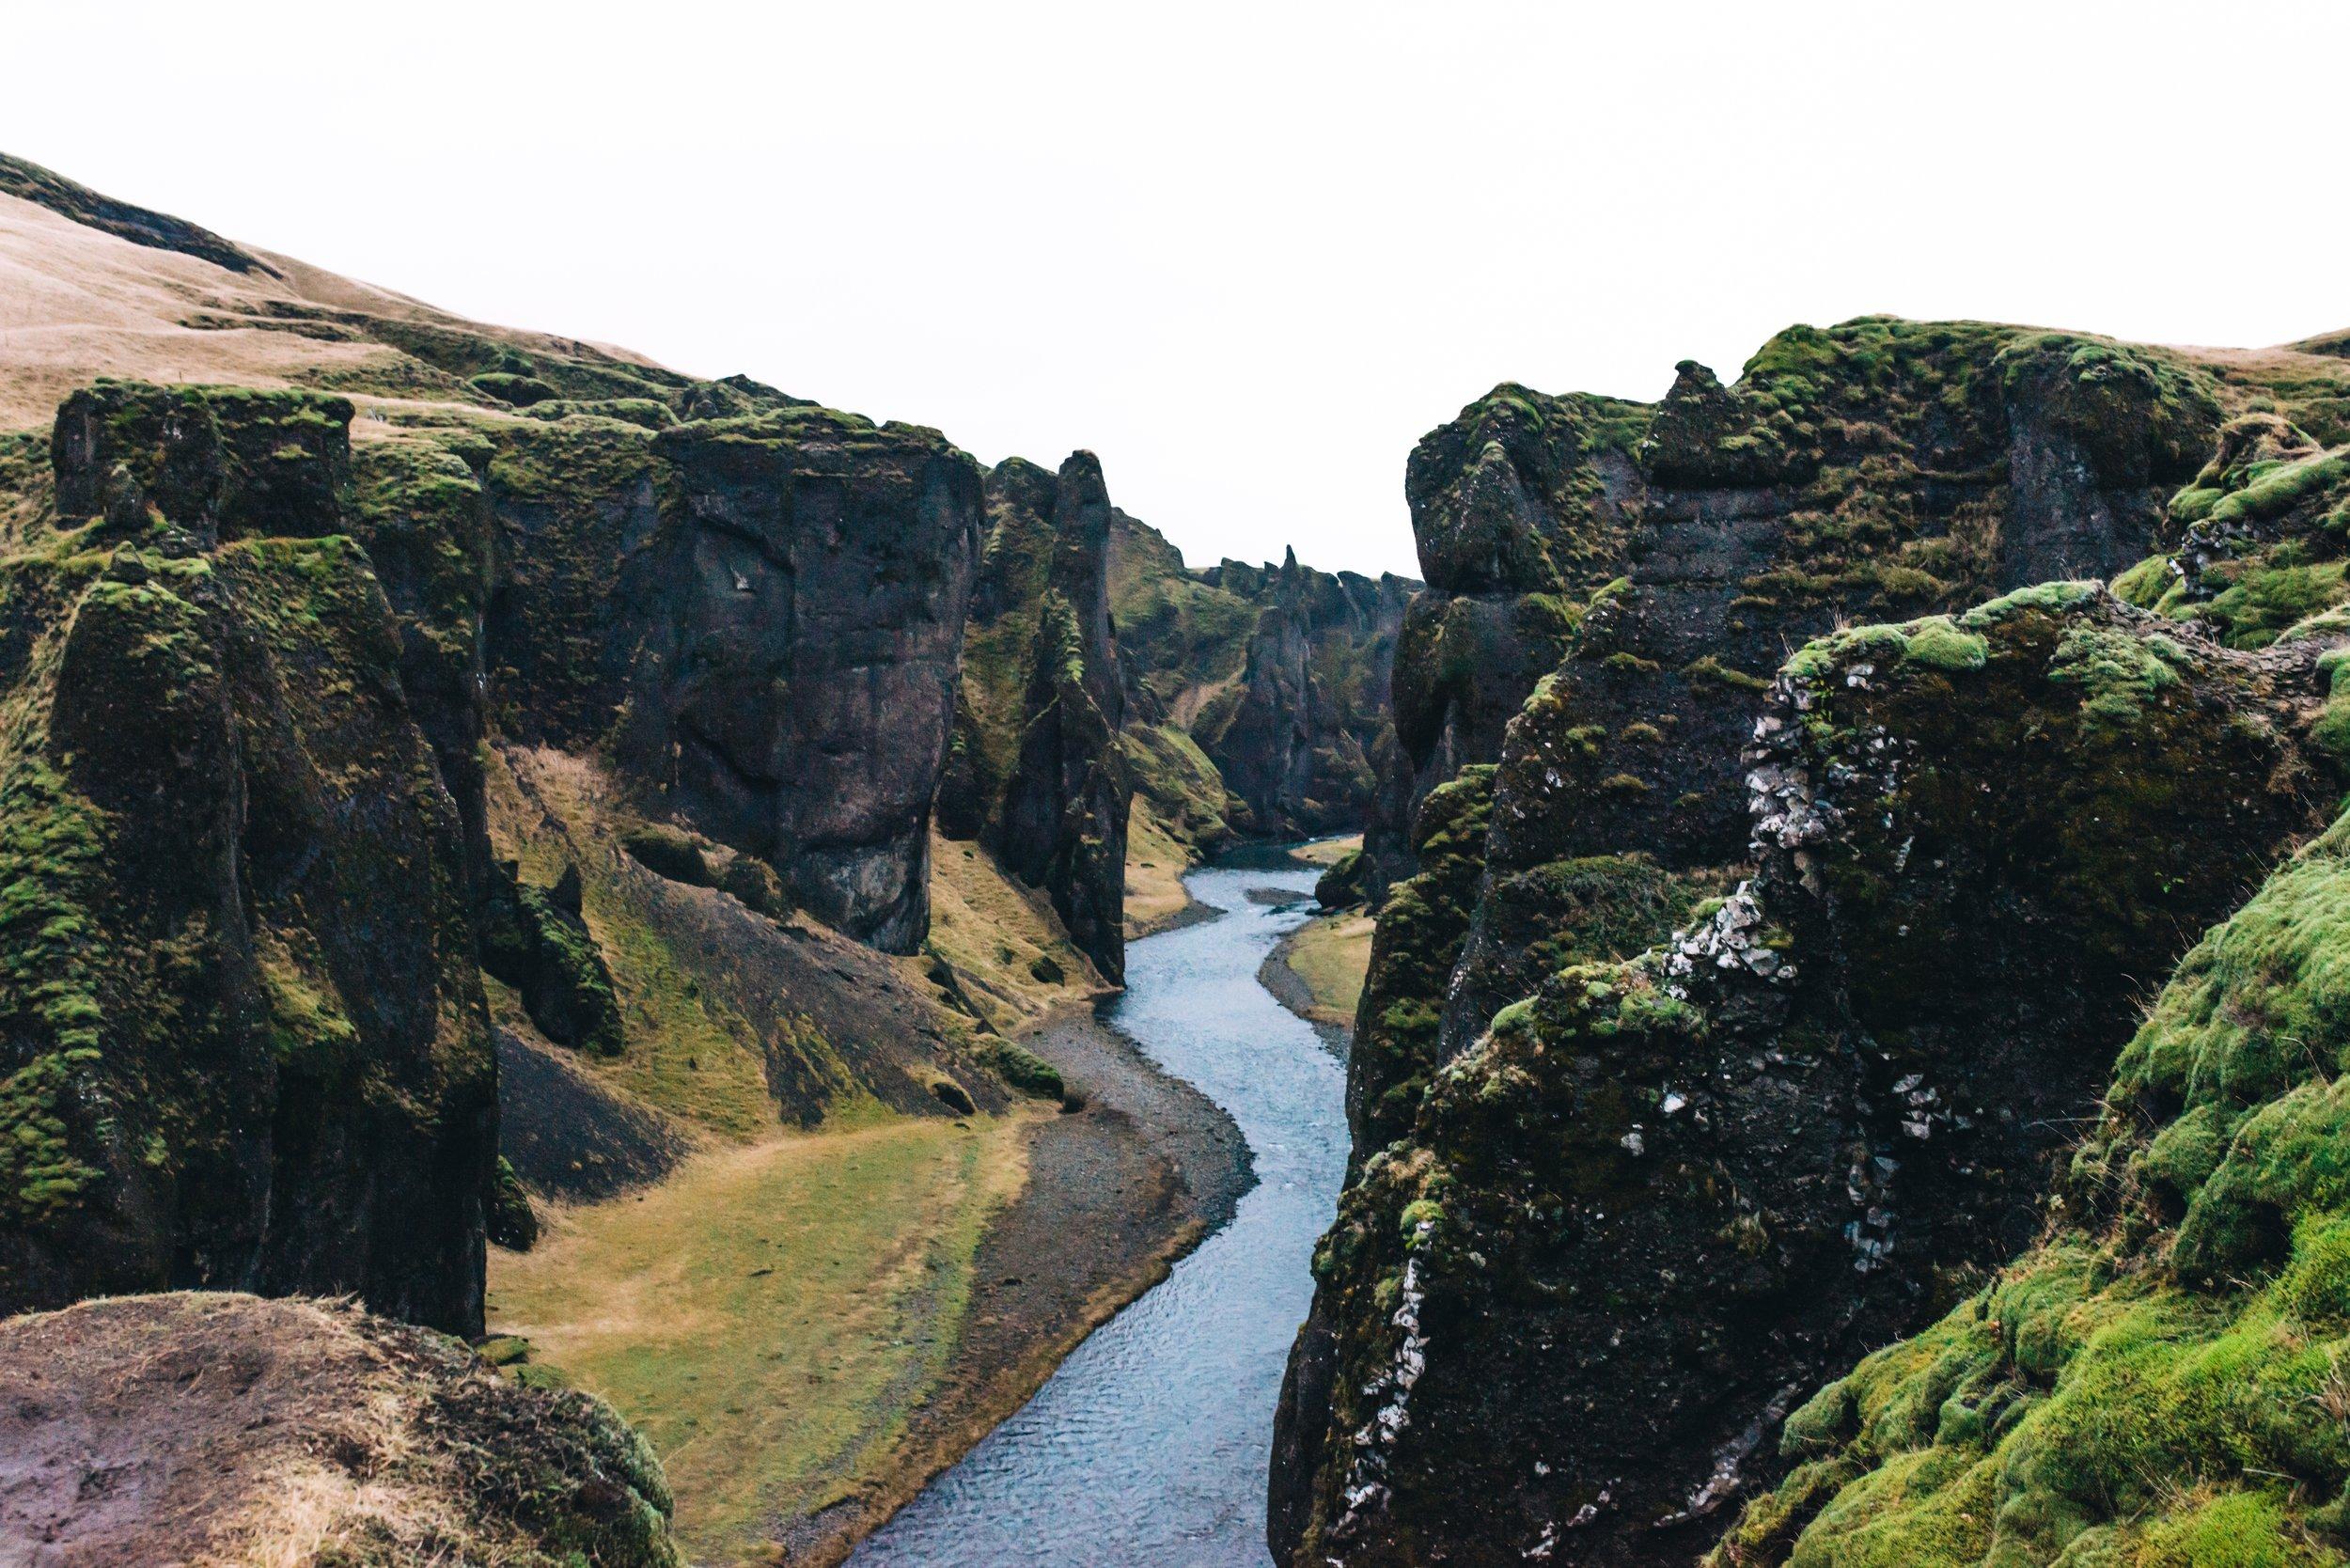 Fjadrargljufur Canyon, don't ask me how to pronounce that